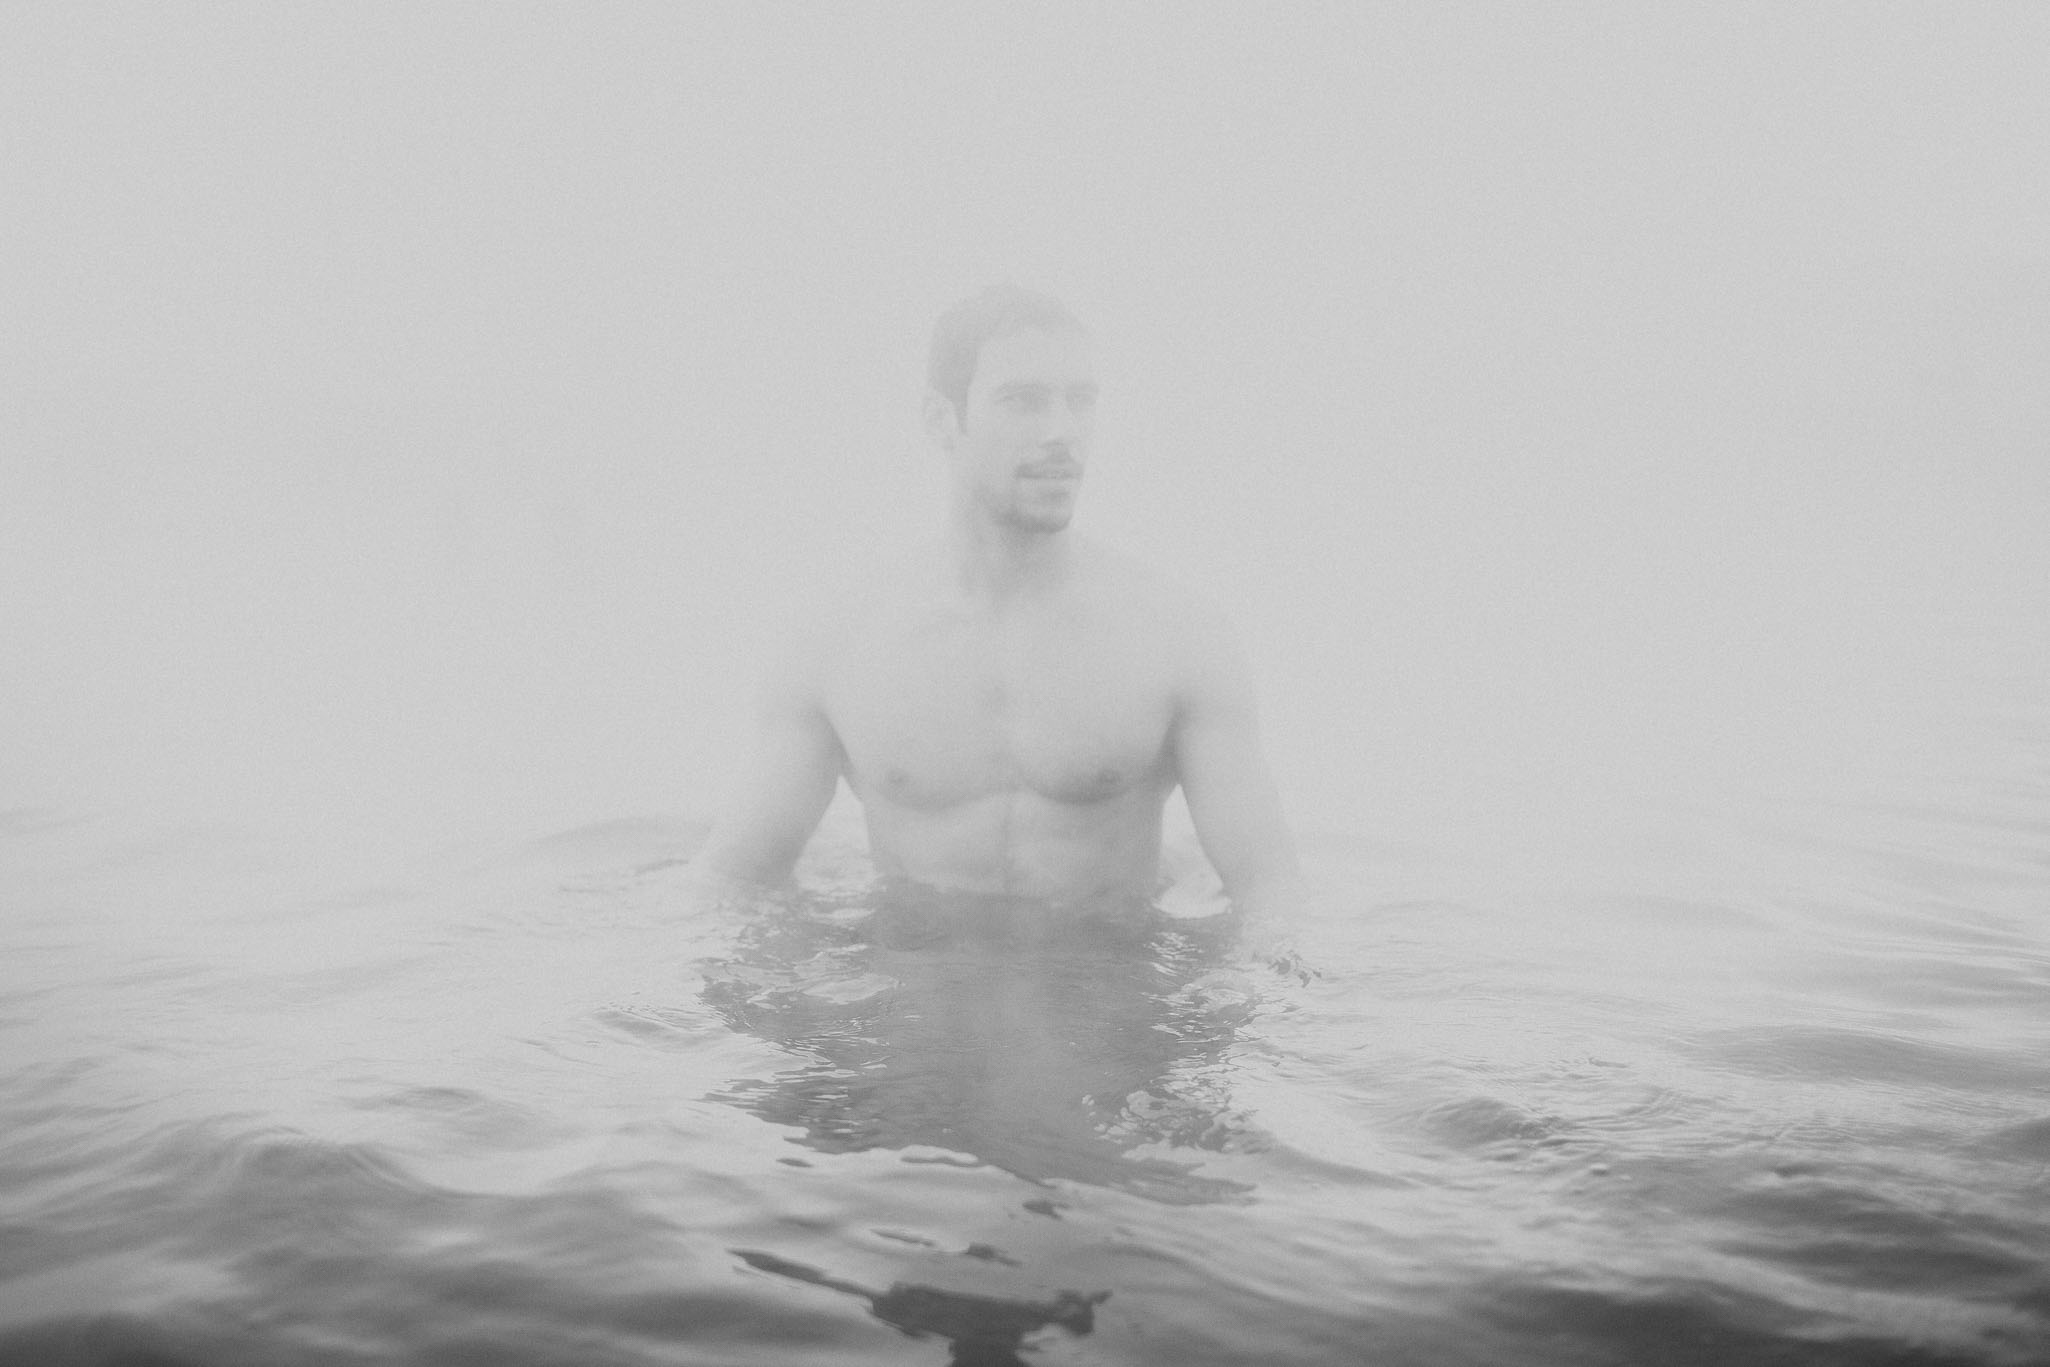 Road-trip-Islande-Iceland-Voyage-Travel-Portrait-Jérémy-Boyer-blue-secret-lagoon-hot-water-bath-1.jpg